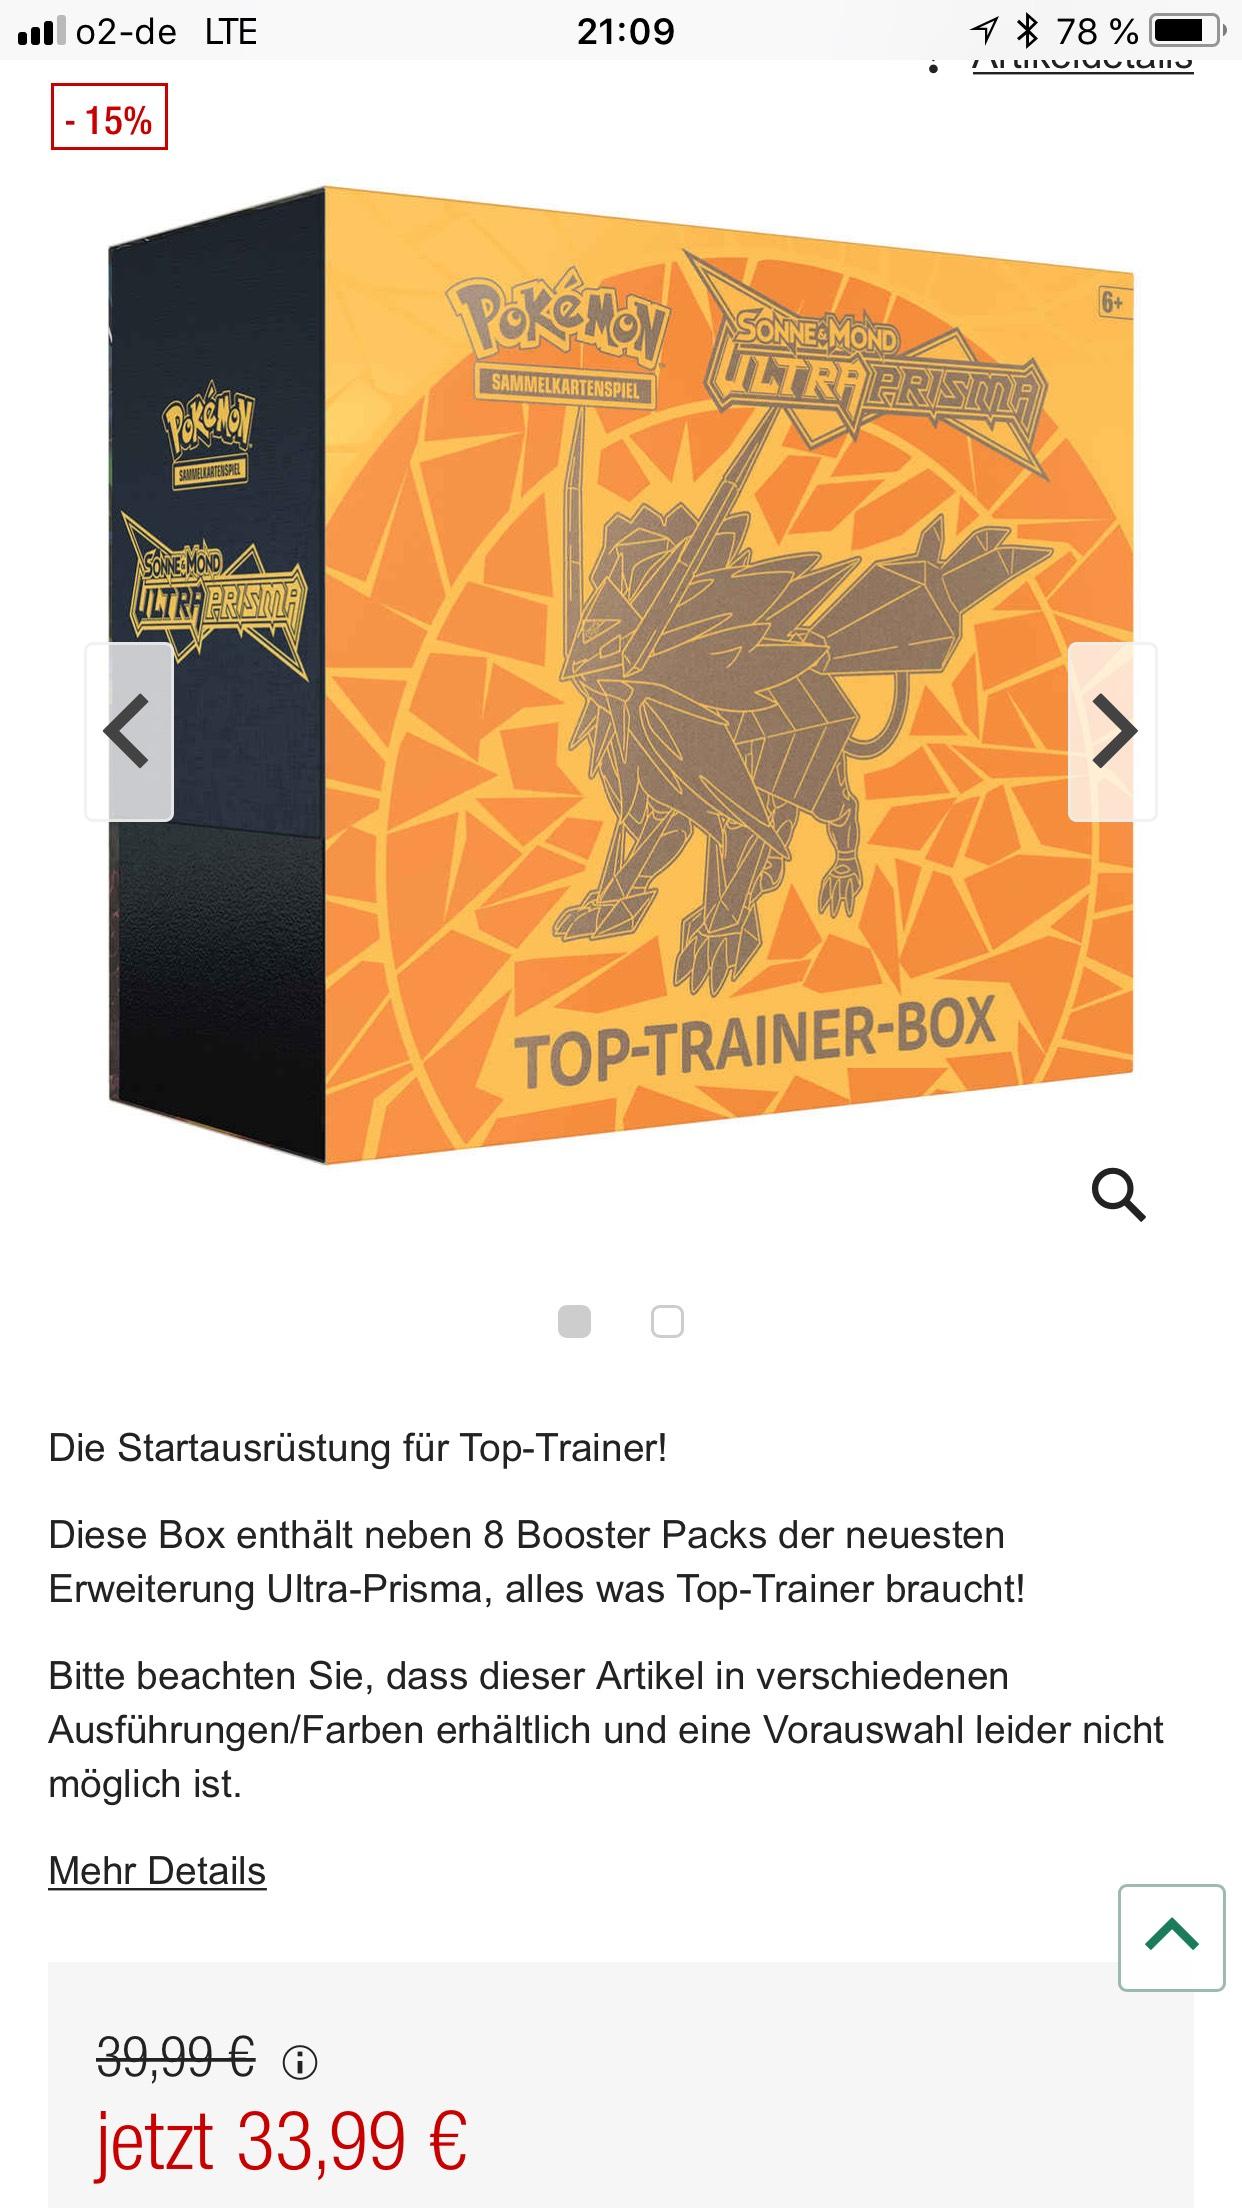 "Galeria Kaufhof - Pokémon - Ultra-Prisma Top Trainer B"", 2fach sortiert"